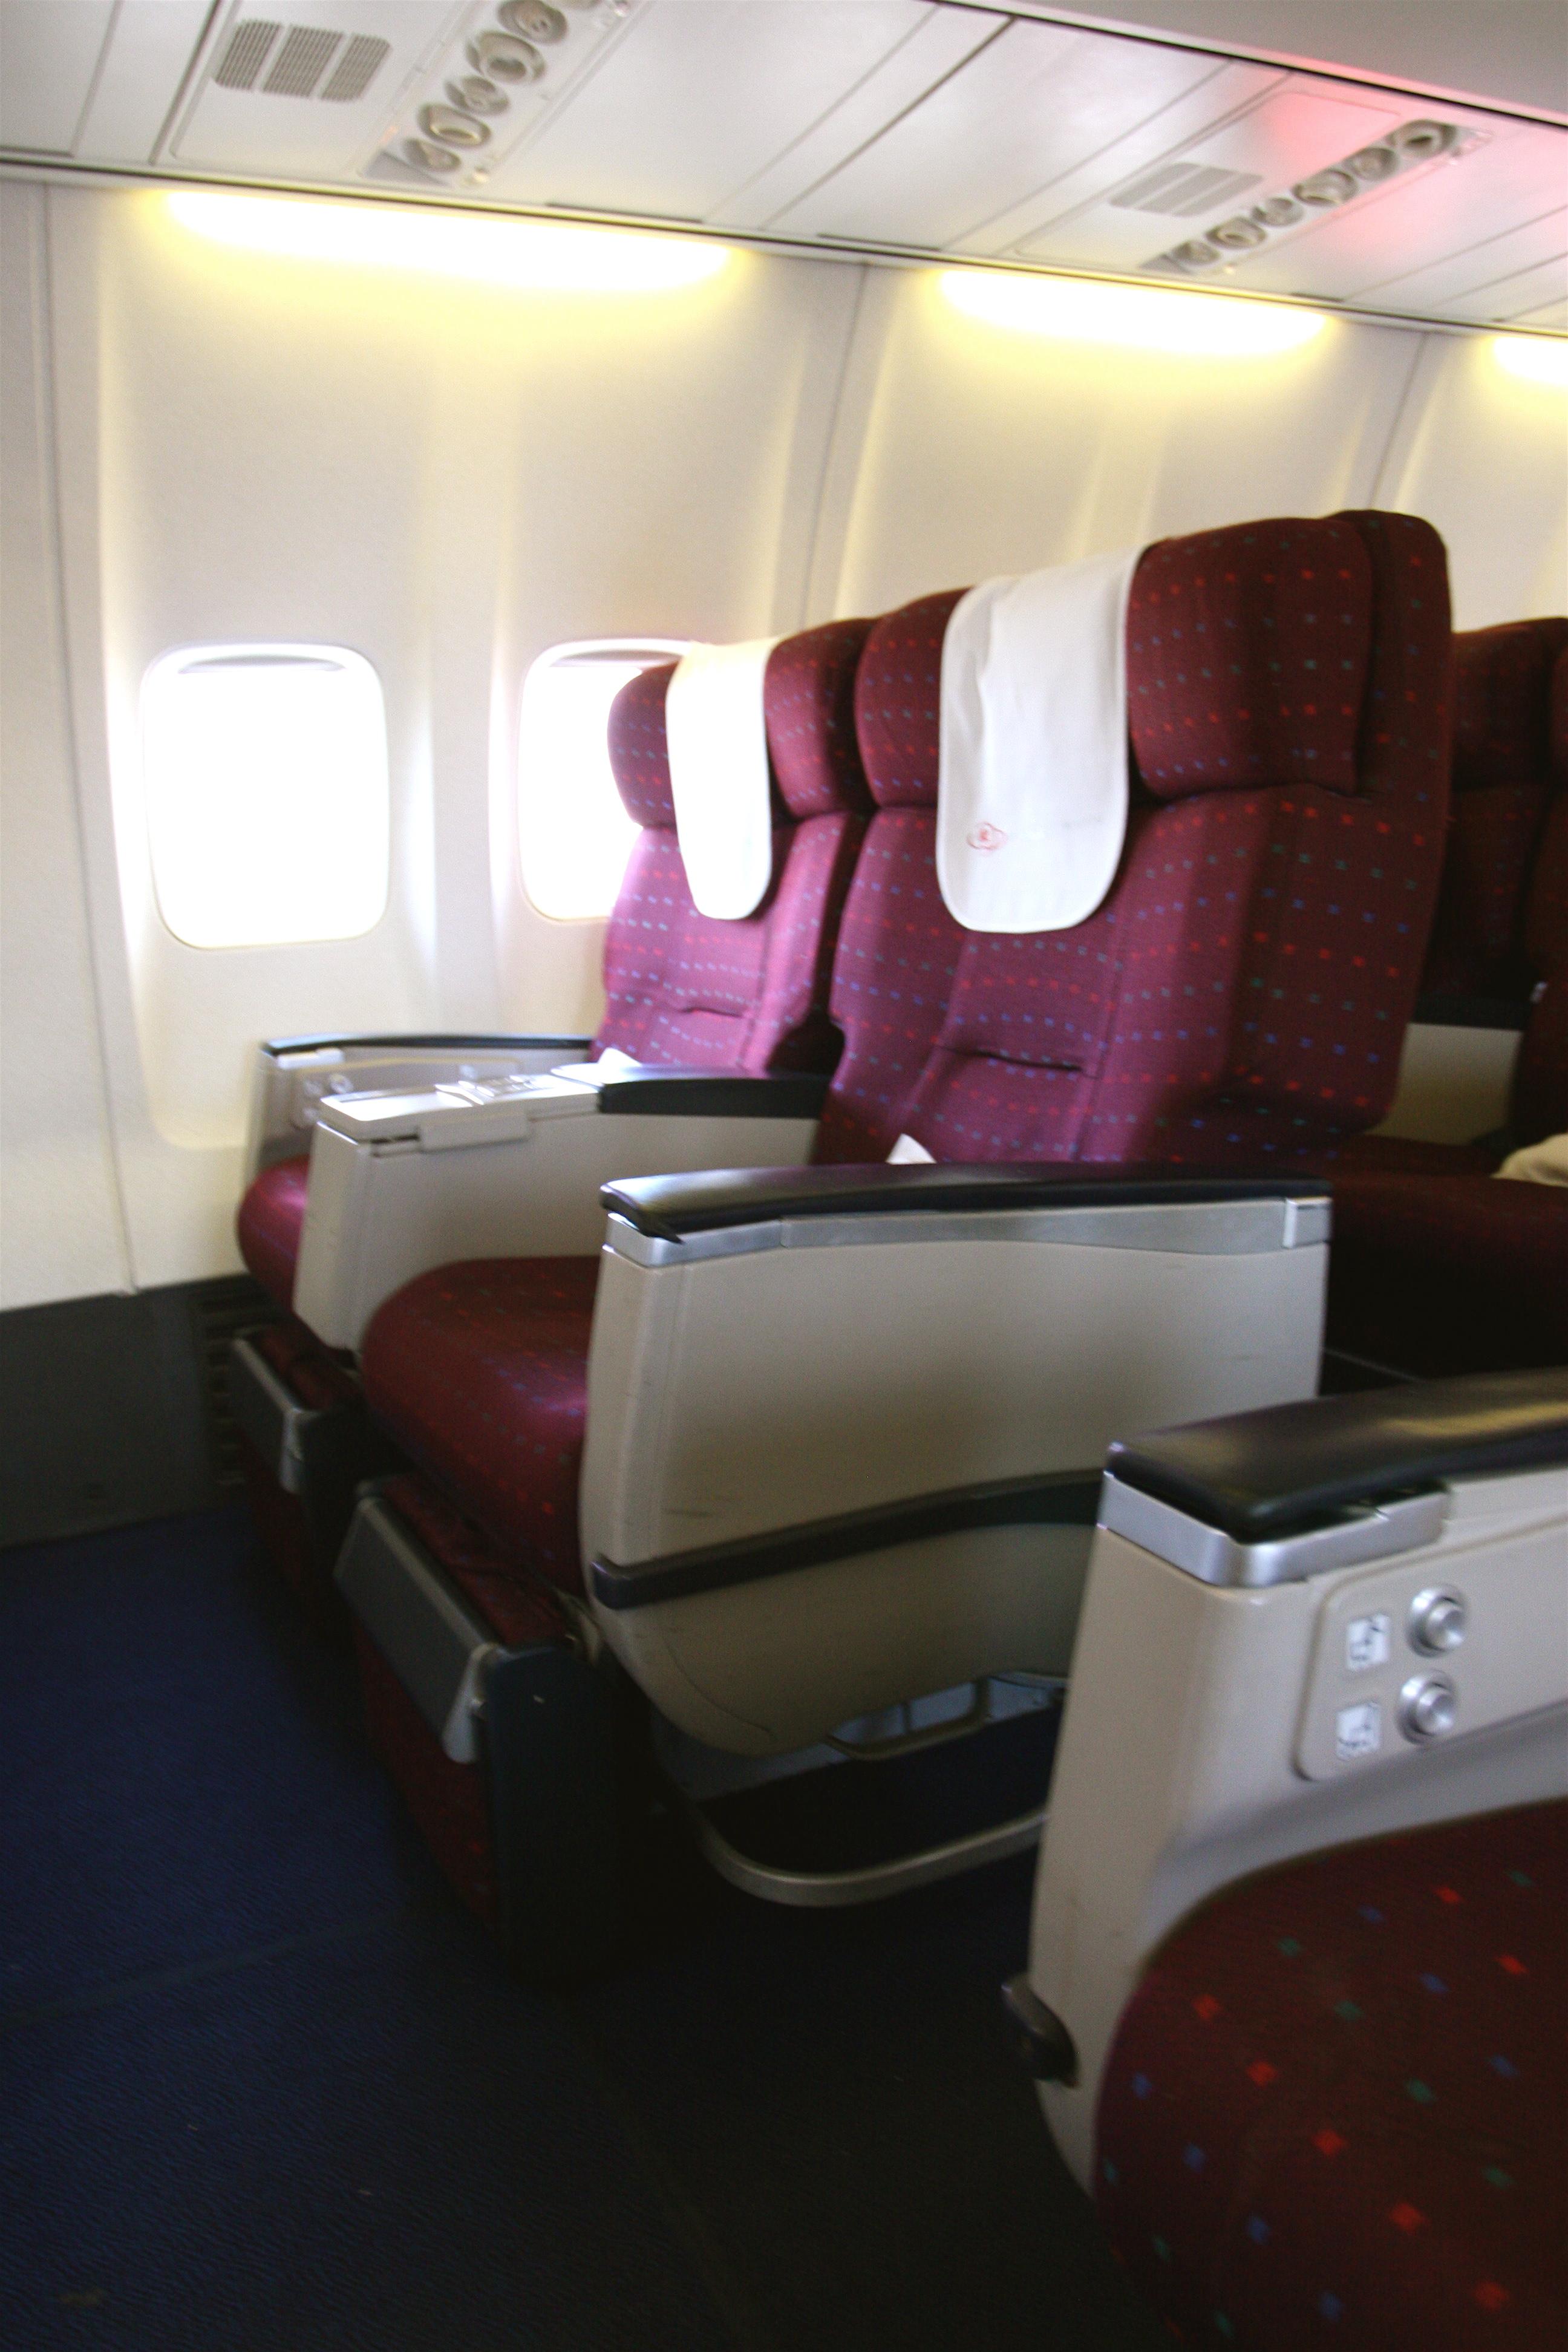 FileKenya Airways Business Class Seat Boeing 737 700